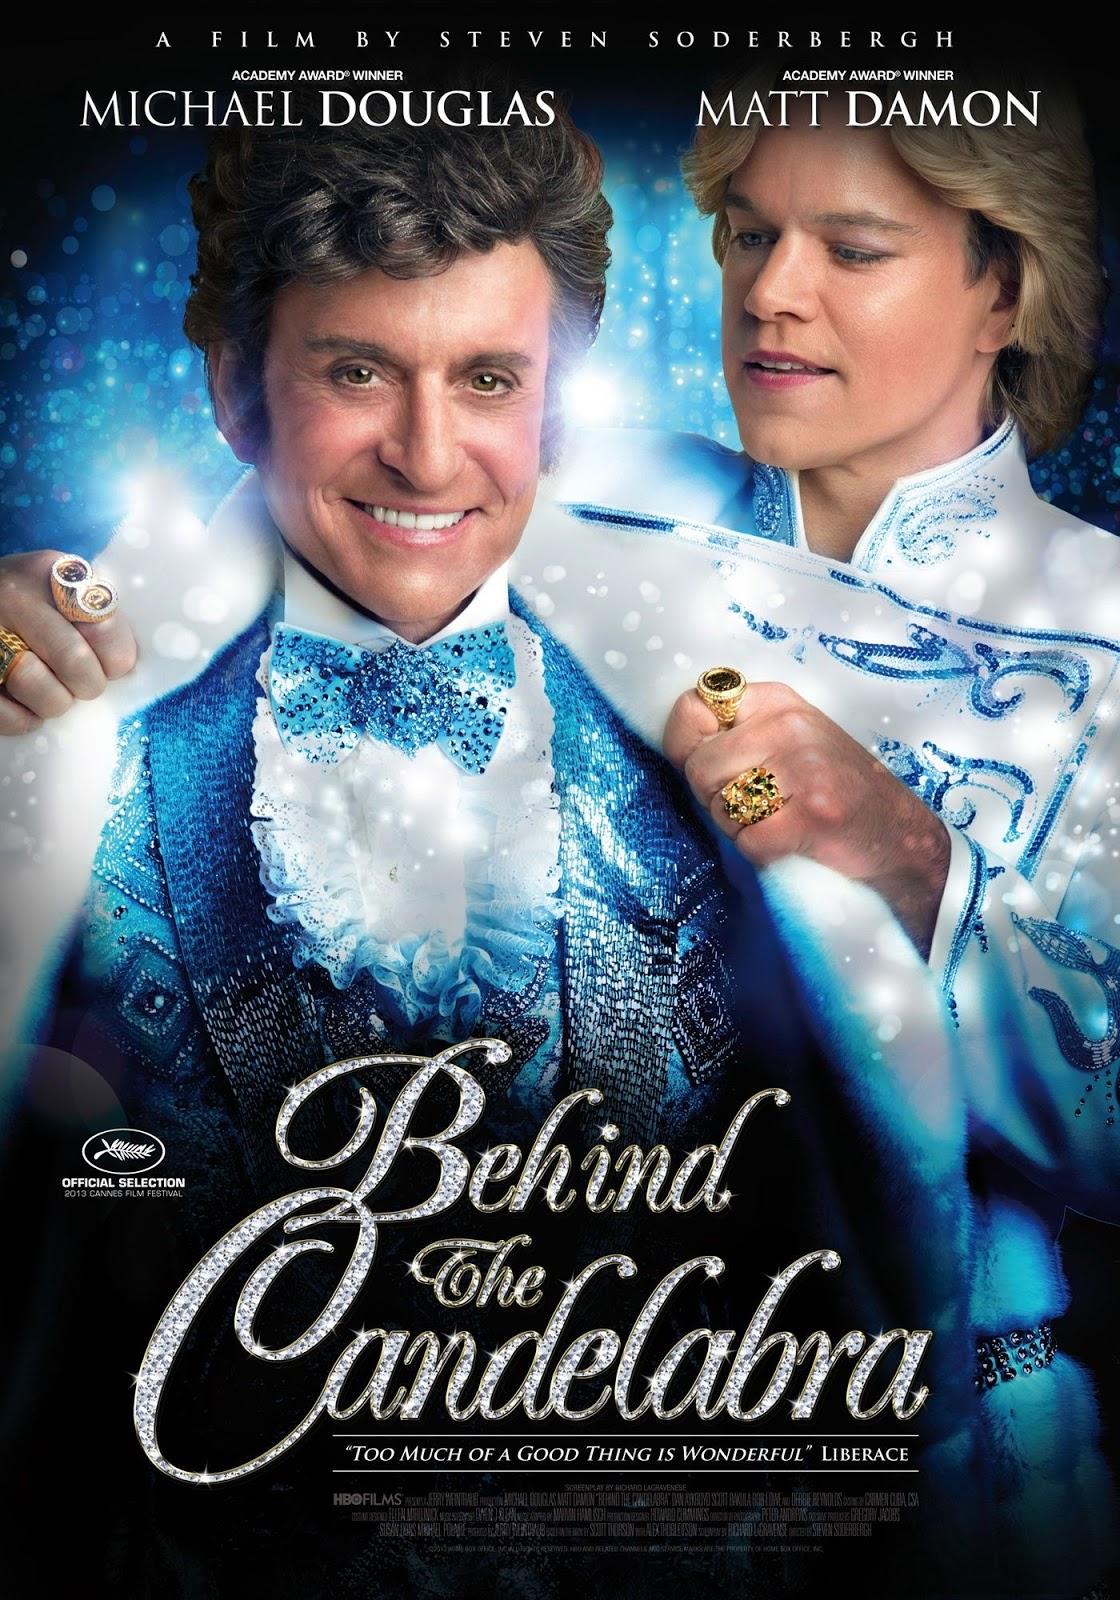 behind-the-candelabra-poster03